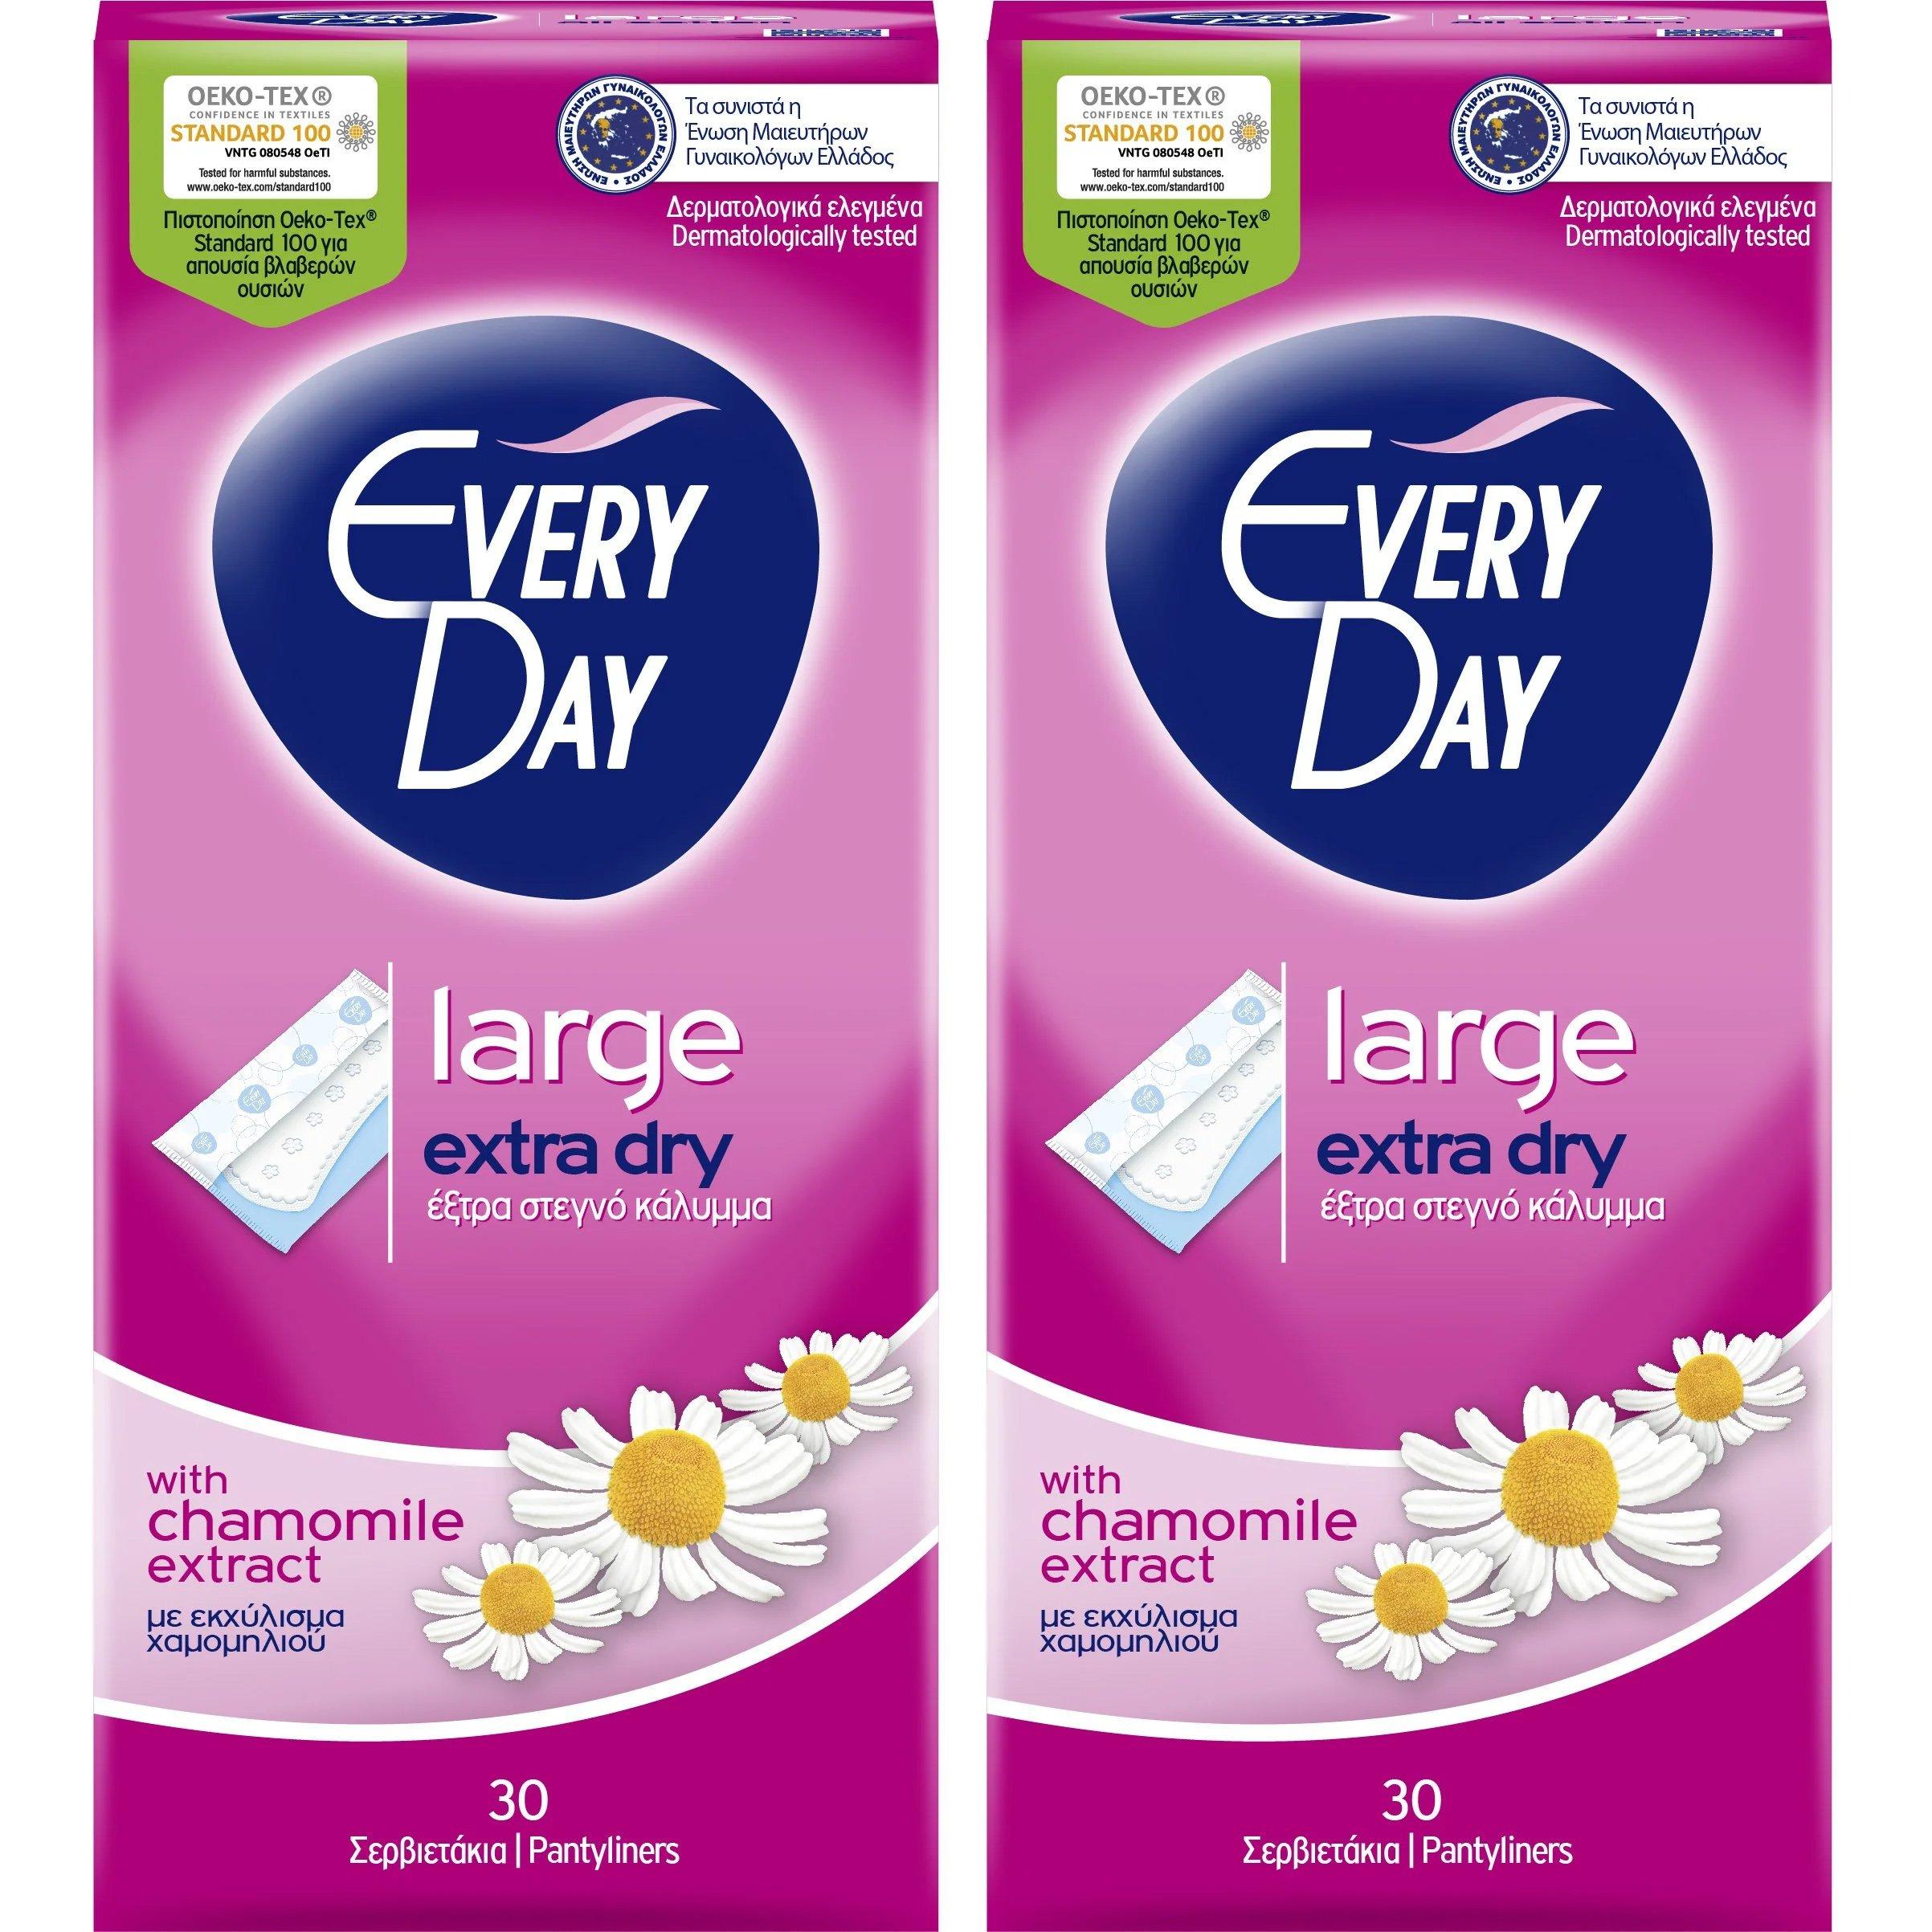 Every Day Πακέτο Προσφοράς Extra Dry Large Ανατομικά Σερβιετάκια για Μεγάλη Ροή 2×30 Τεμάχια 1+1 Δώρο